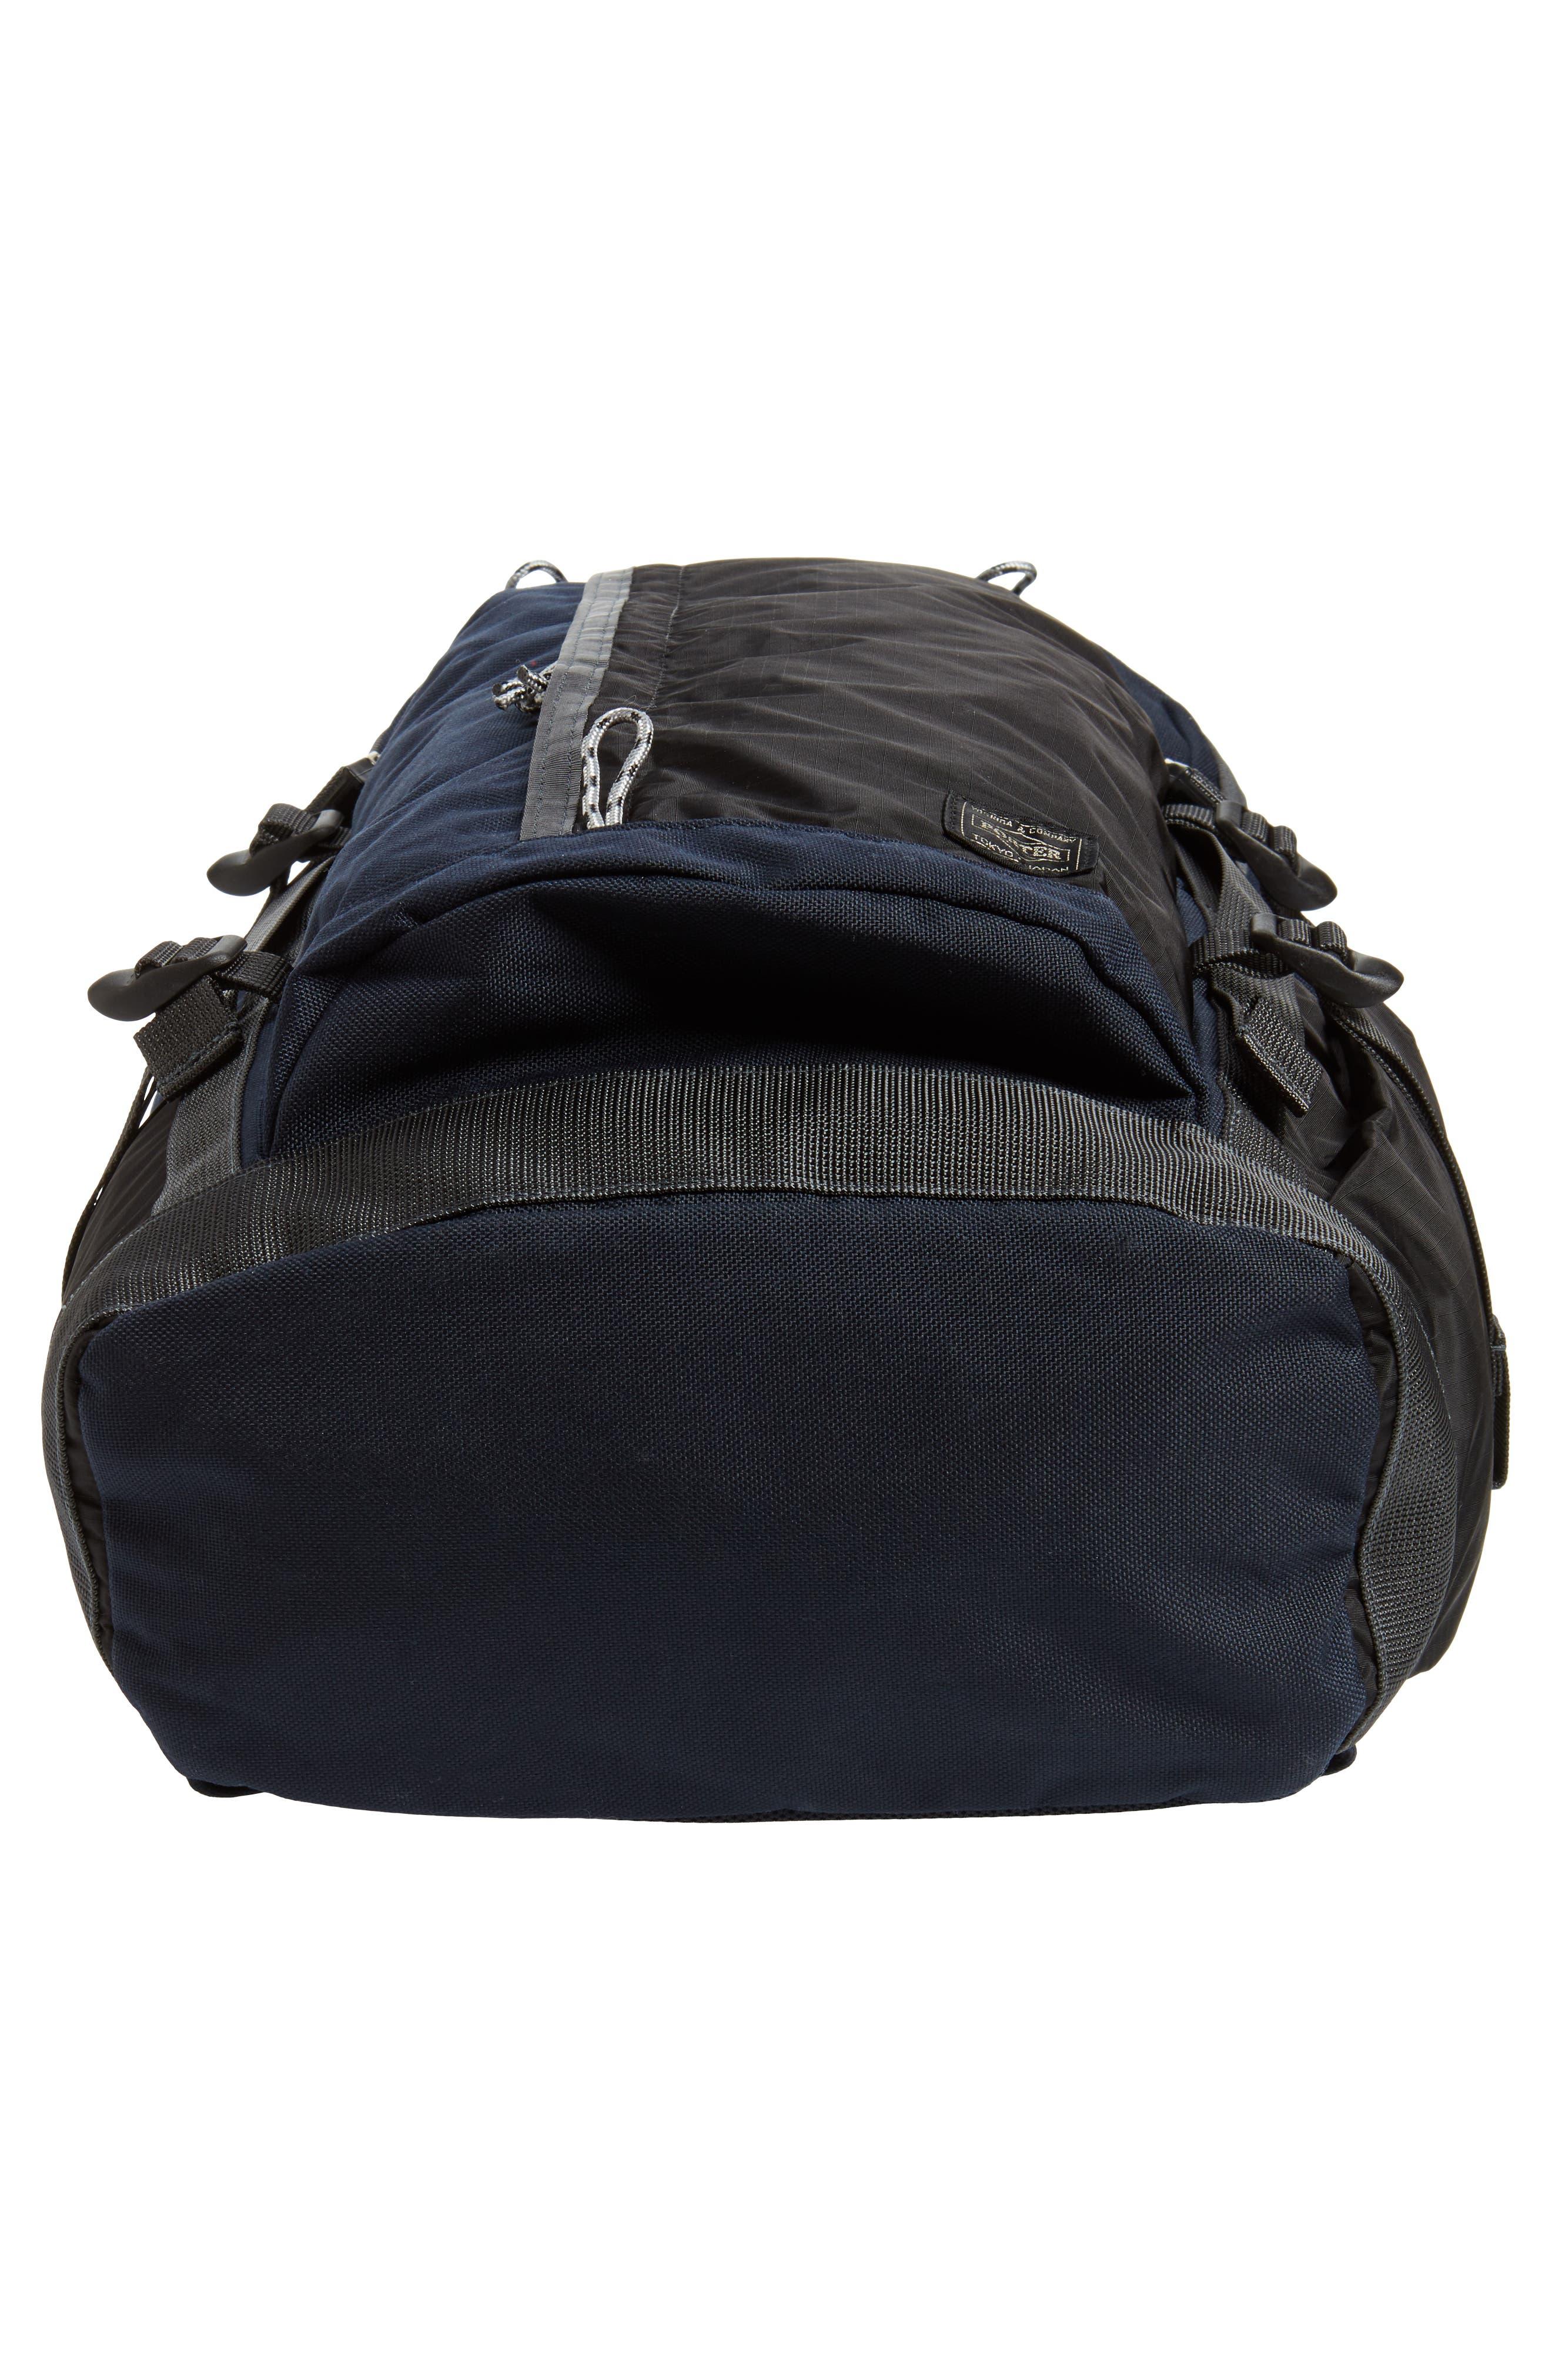 Porter-Yoshida & Co. Hype Backpack,                             Alternate thumbnail 6, color,                             Navy/ Black